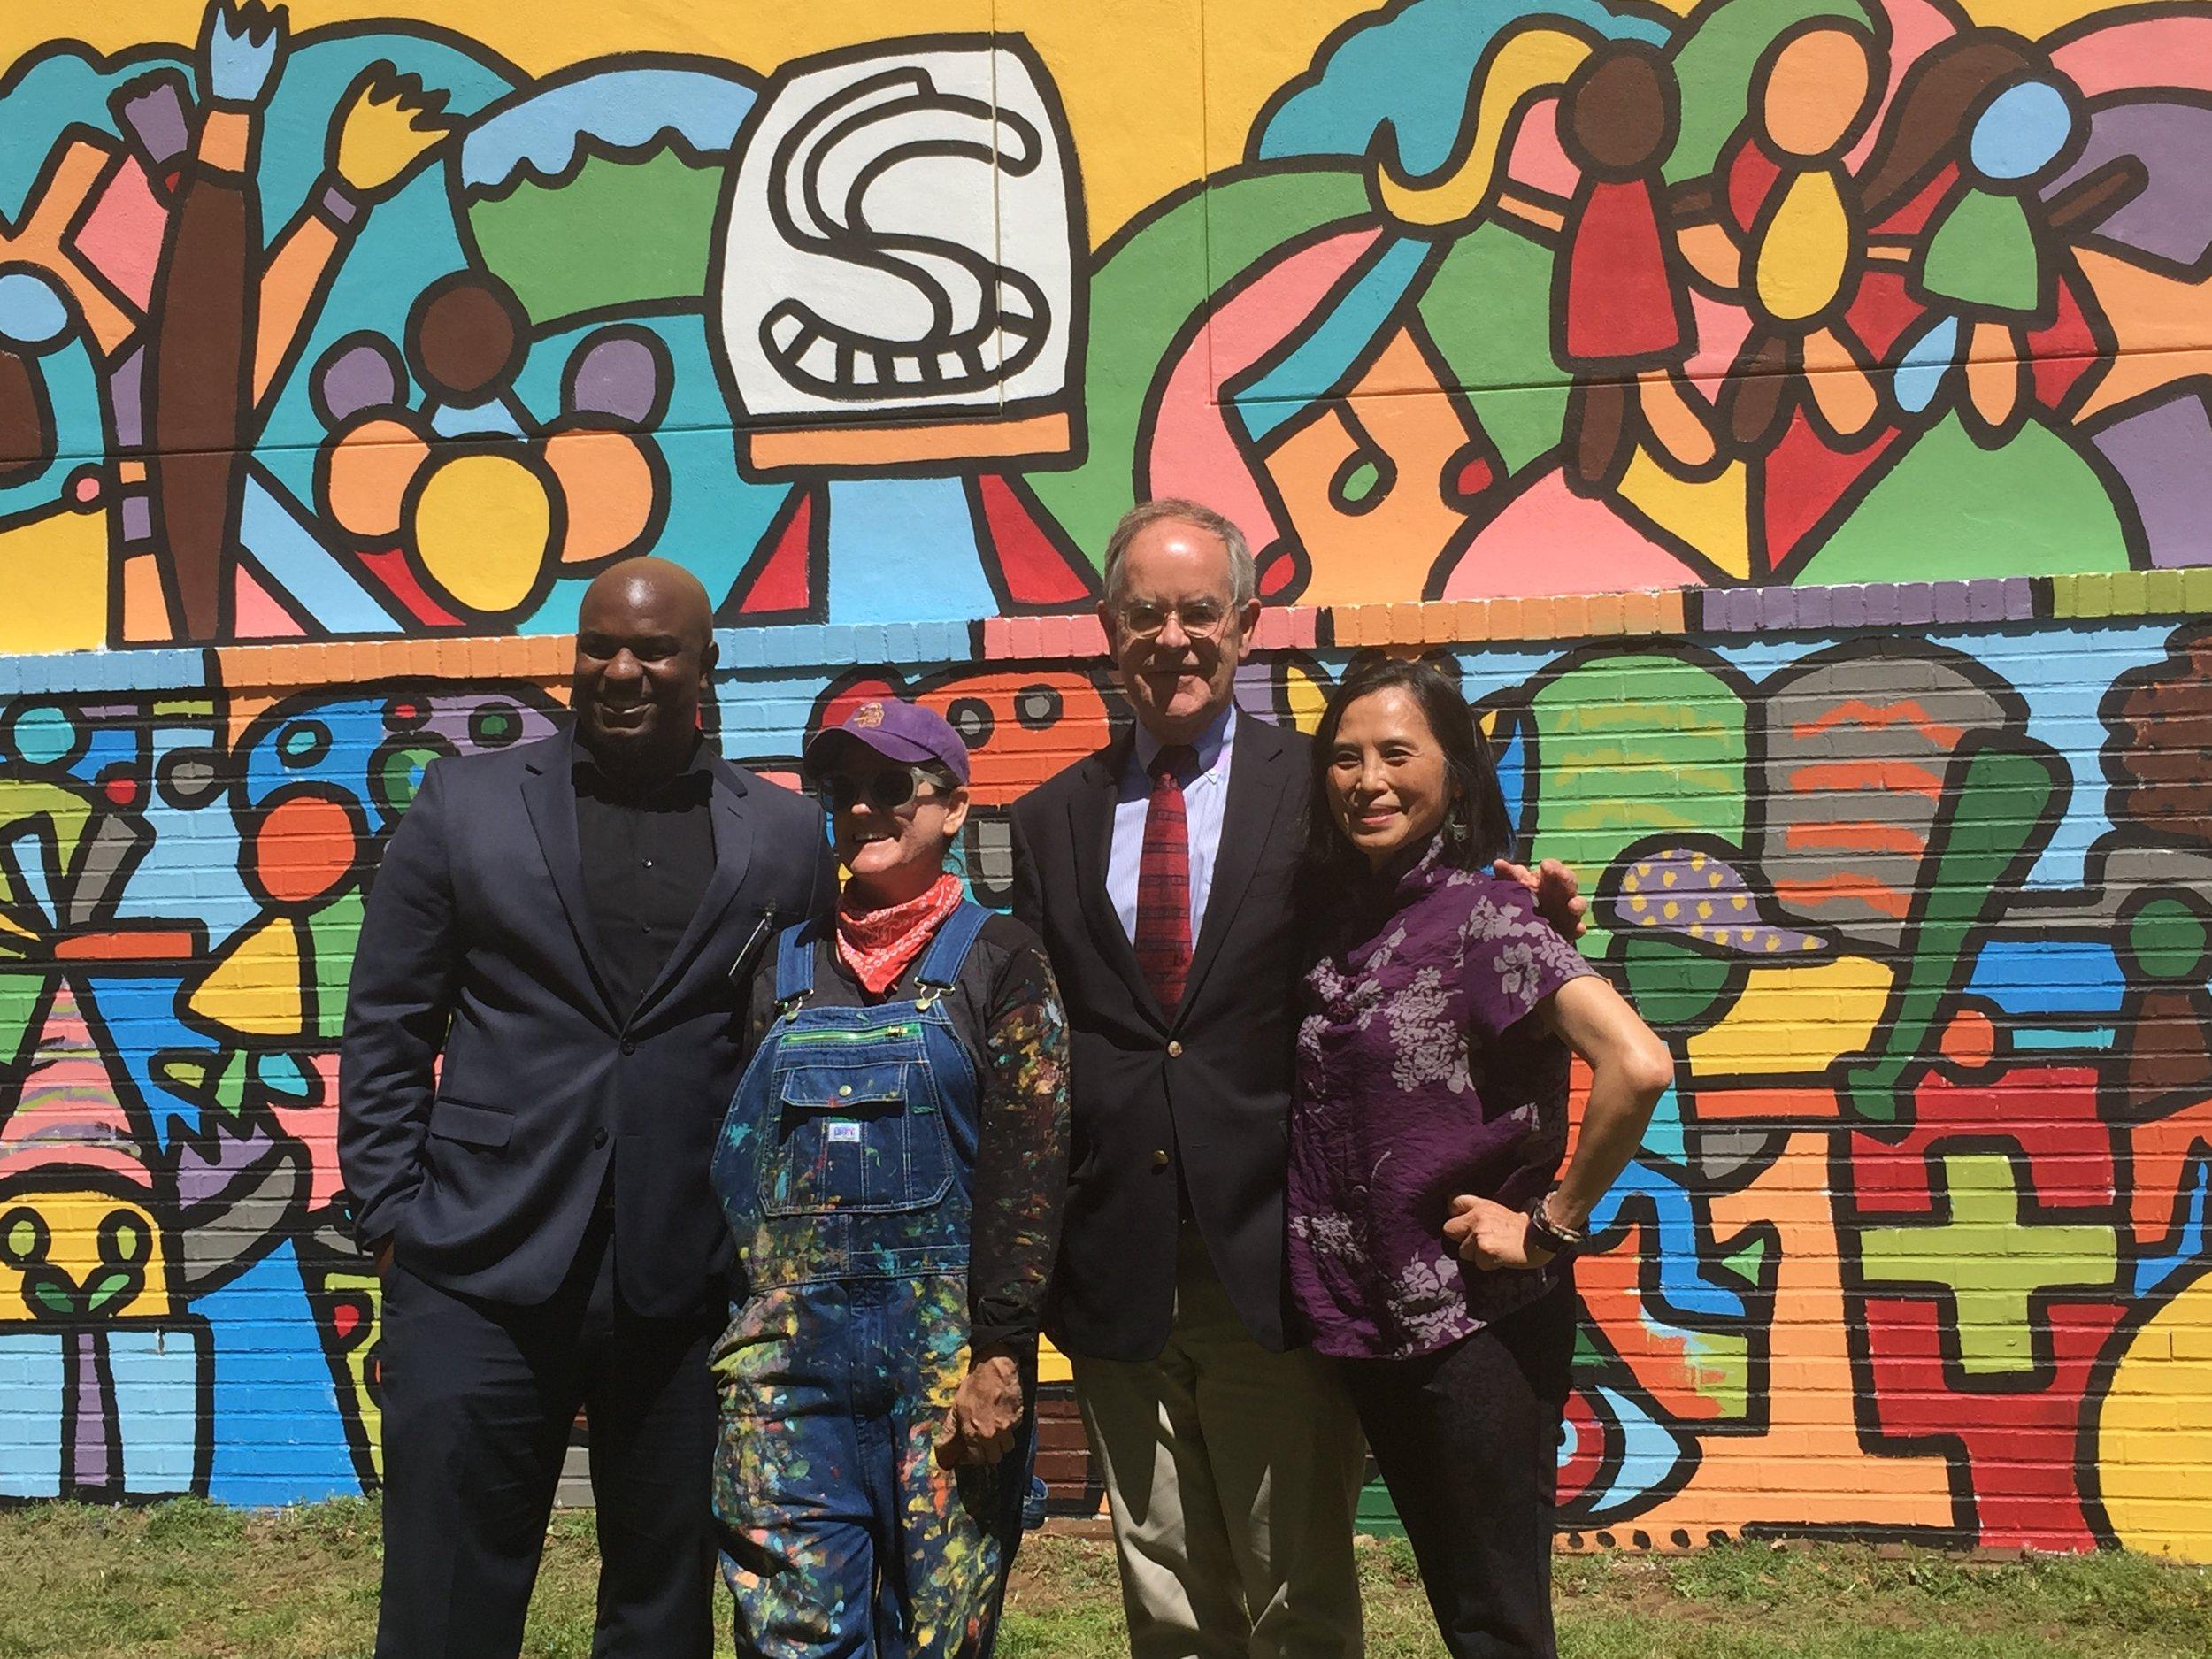 Warner Elementary's student mural